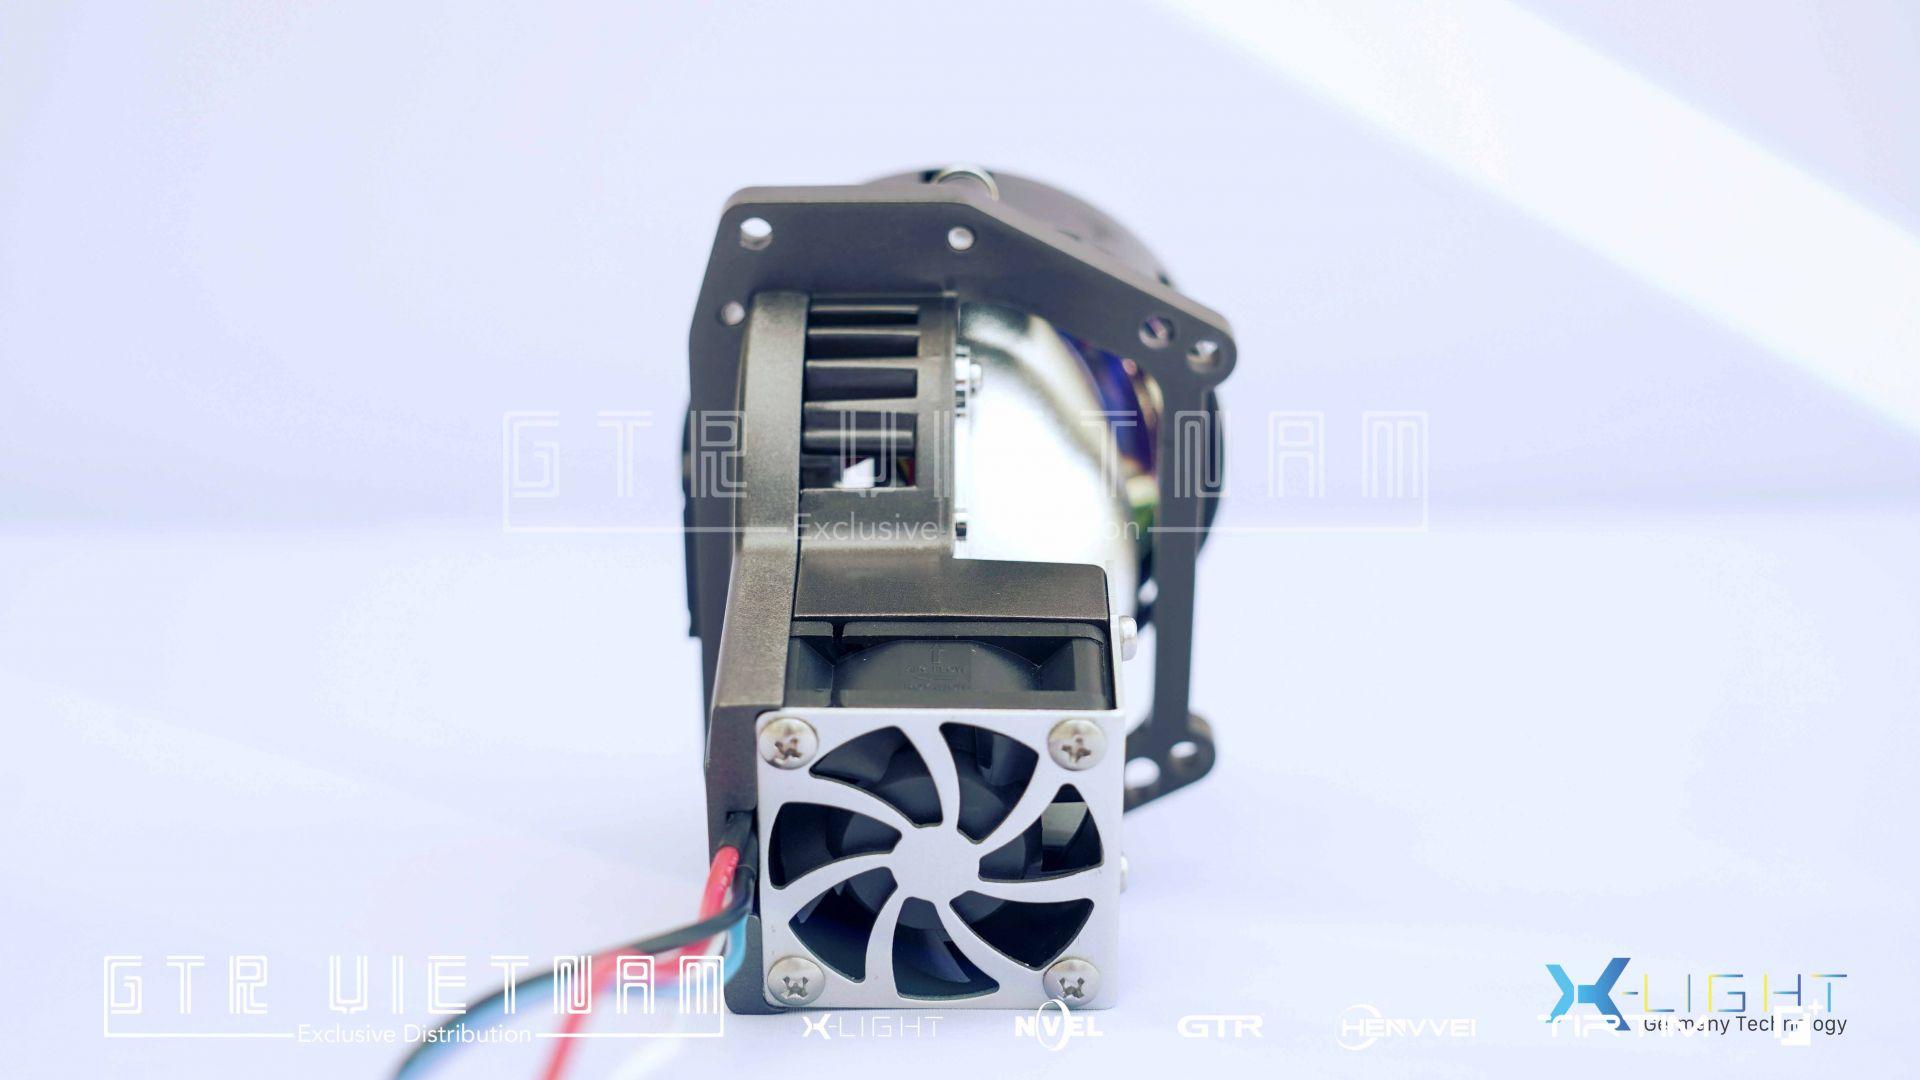 bi led x-light v20